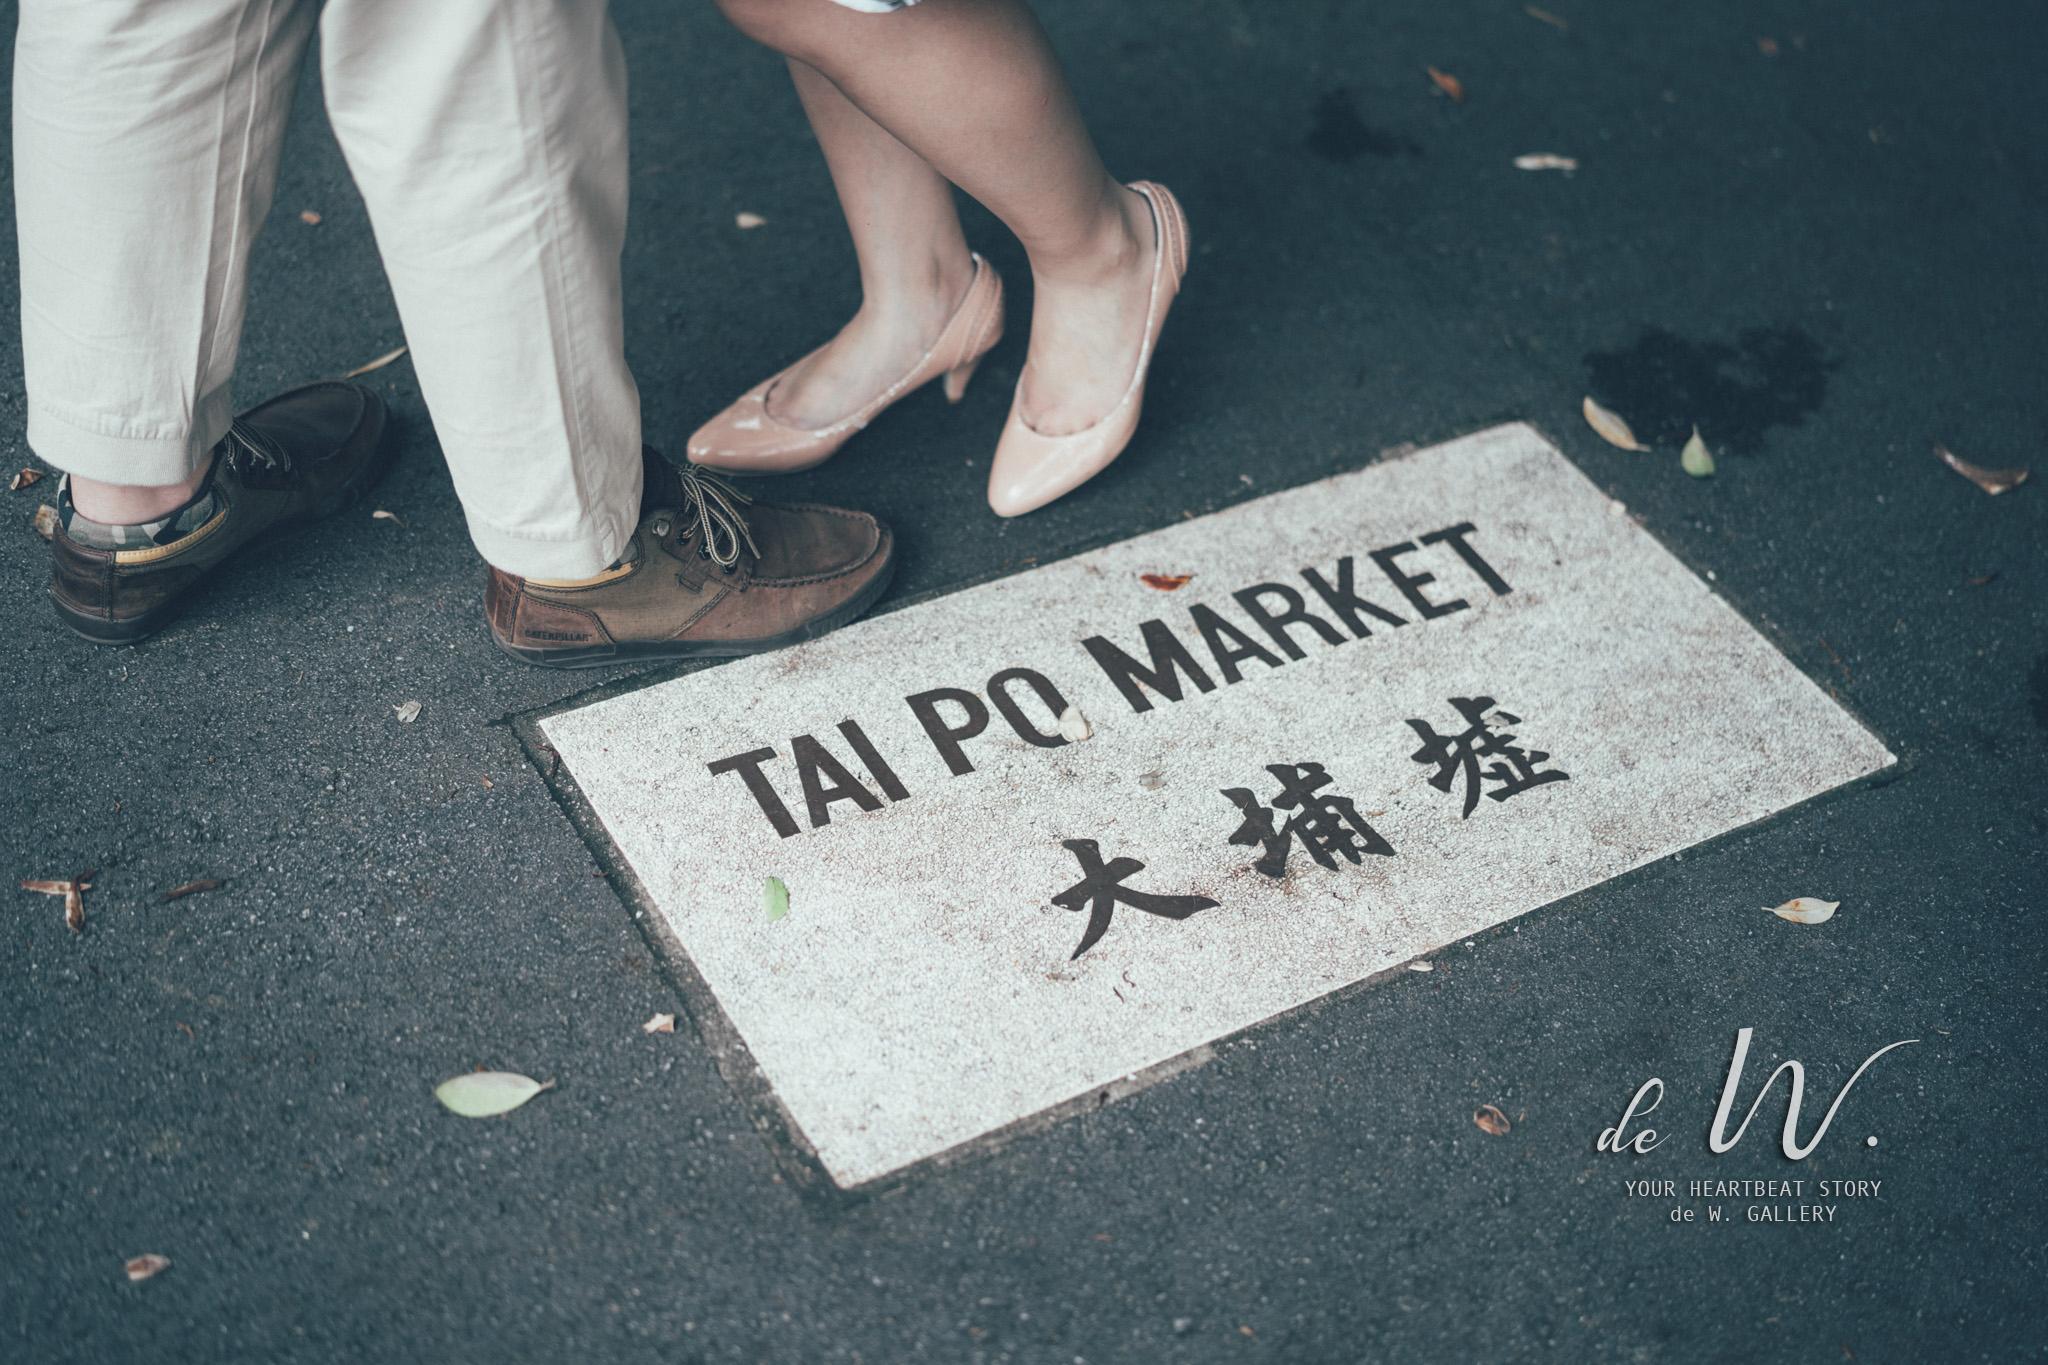 film style story teller de w gallery top10 destination wedding 大埔 火車 2048-003